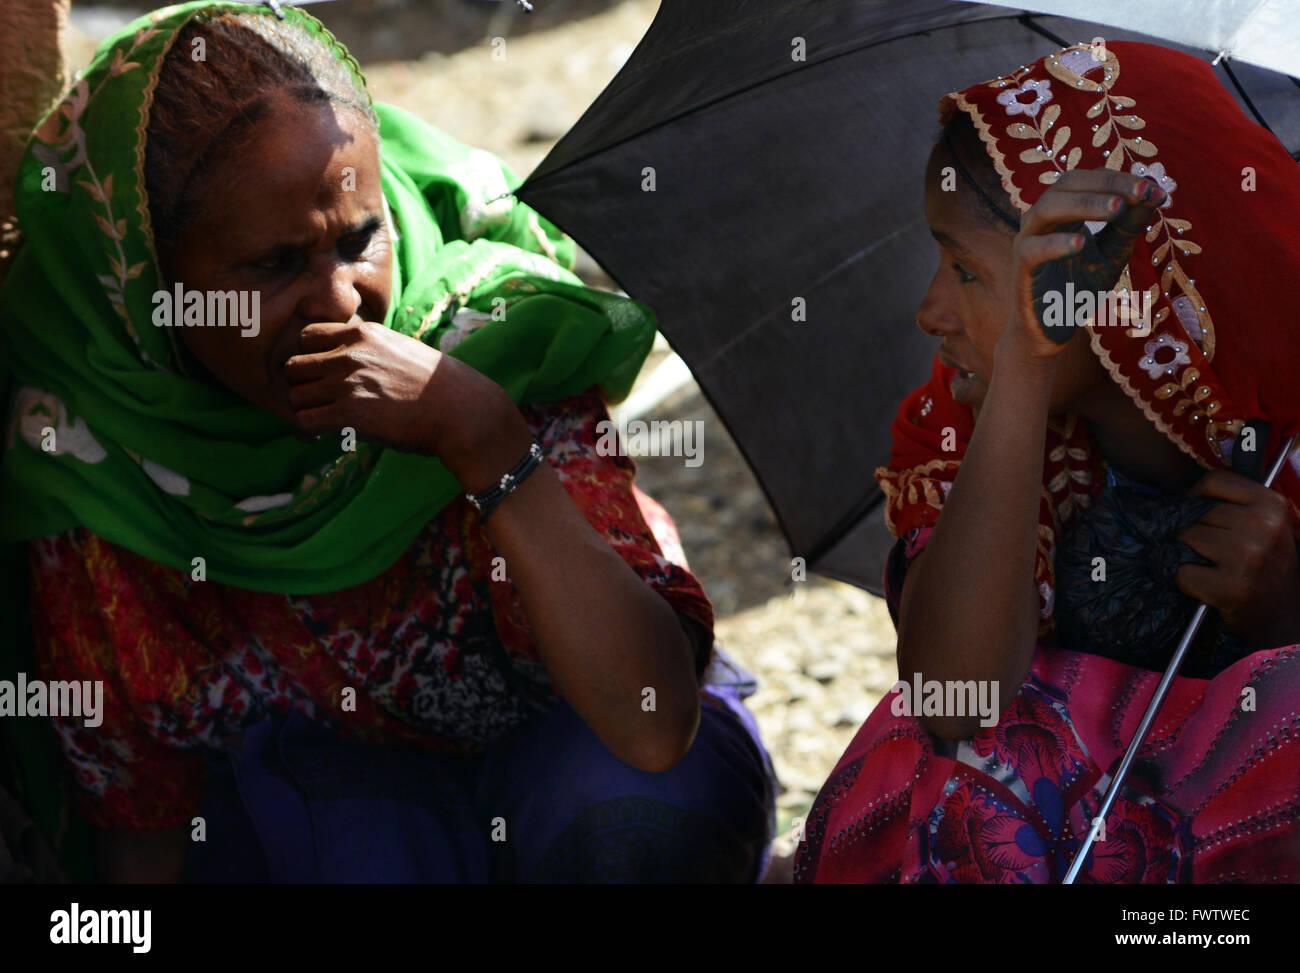 Oromo women under the umbrella in the colorful weekly market in Bati, Ethiopia. - Stock Image